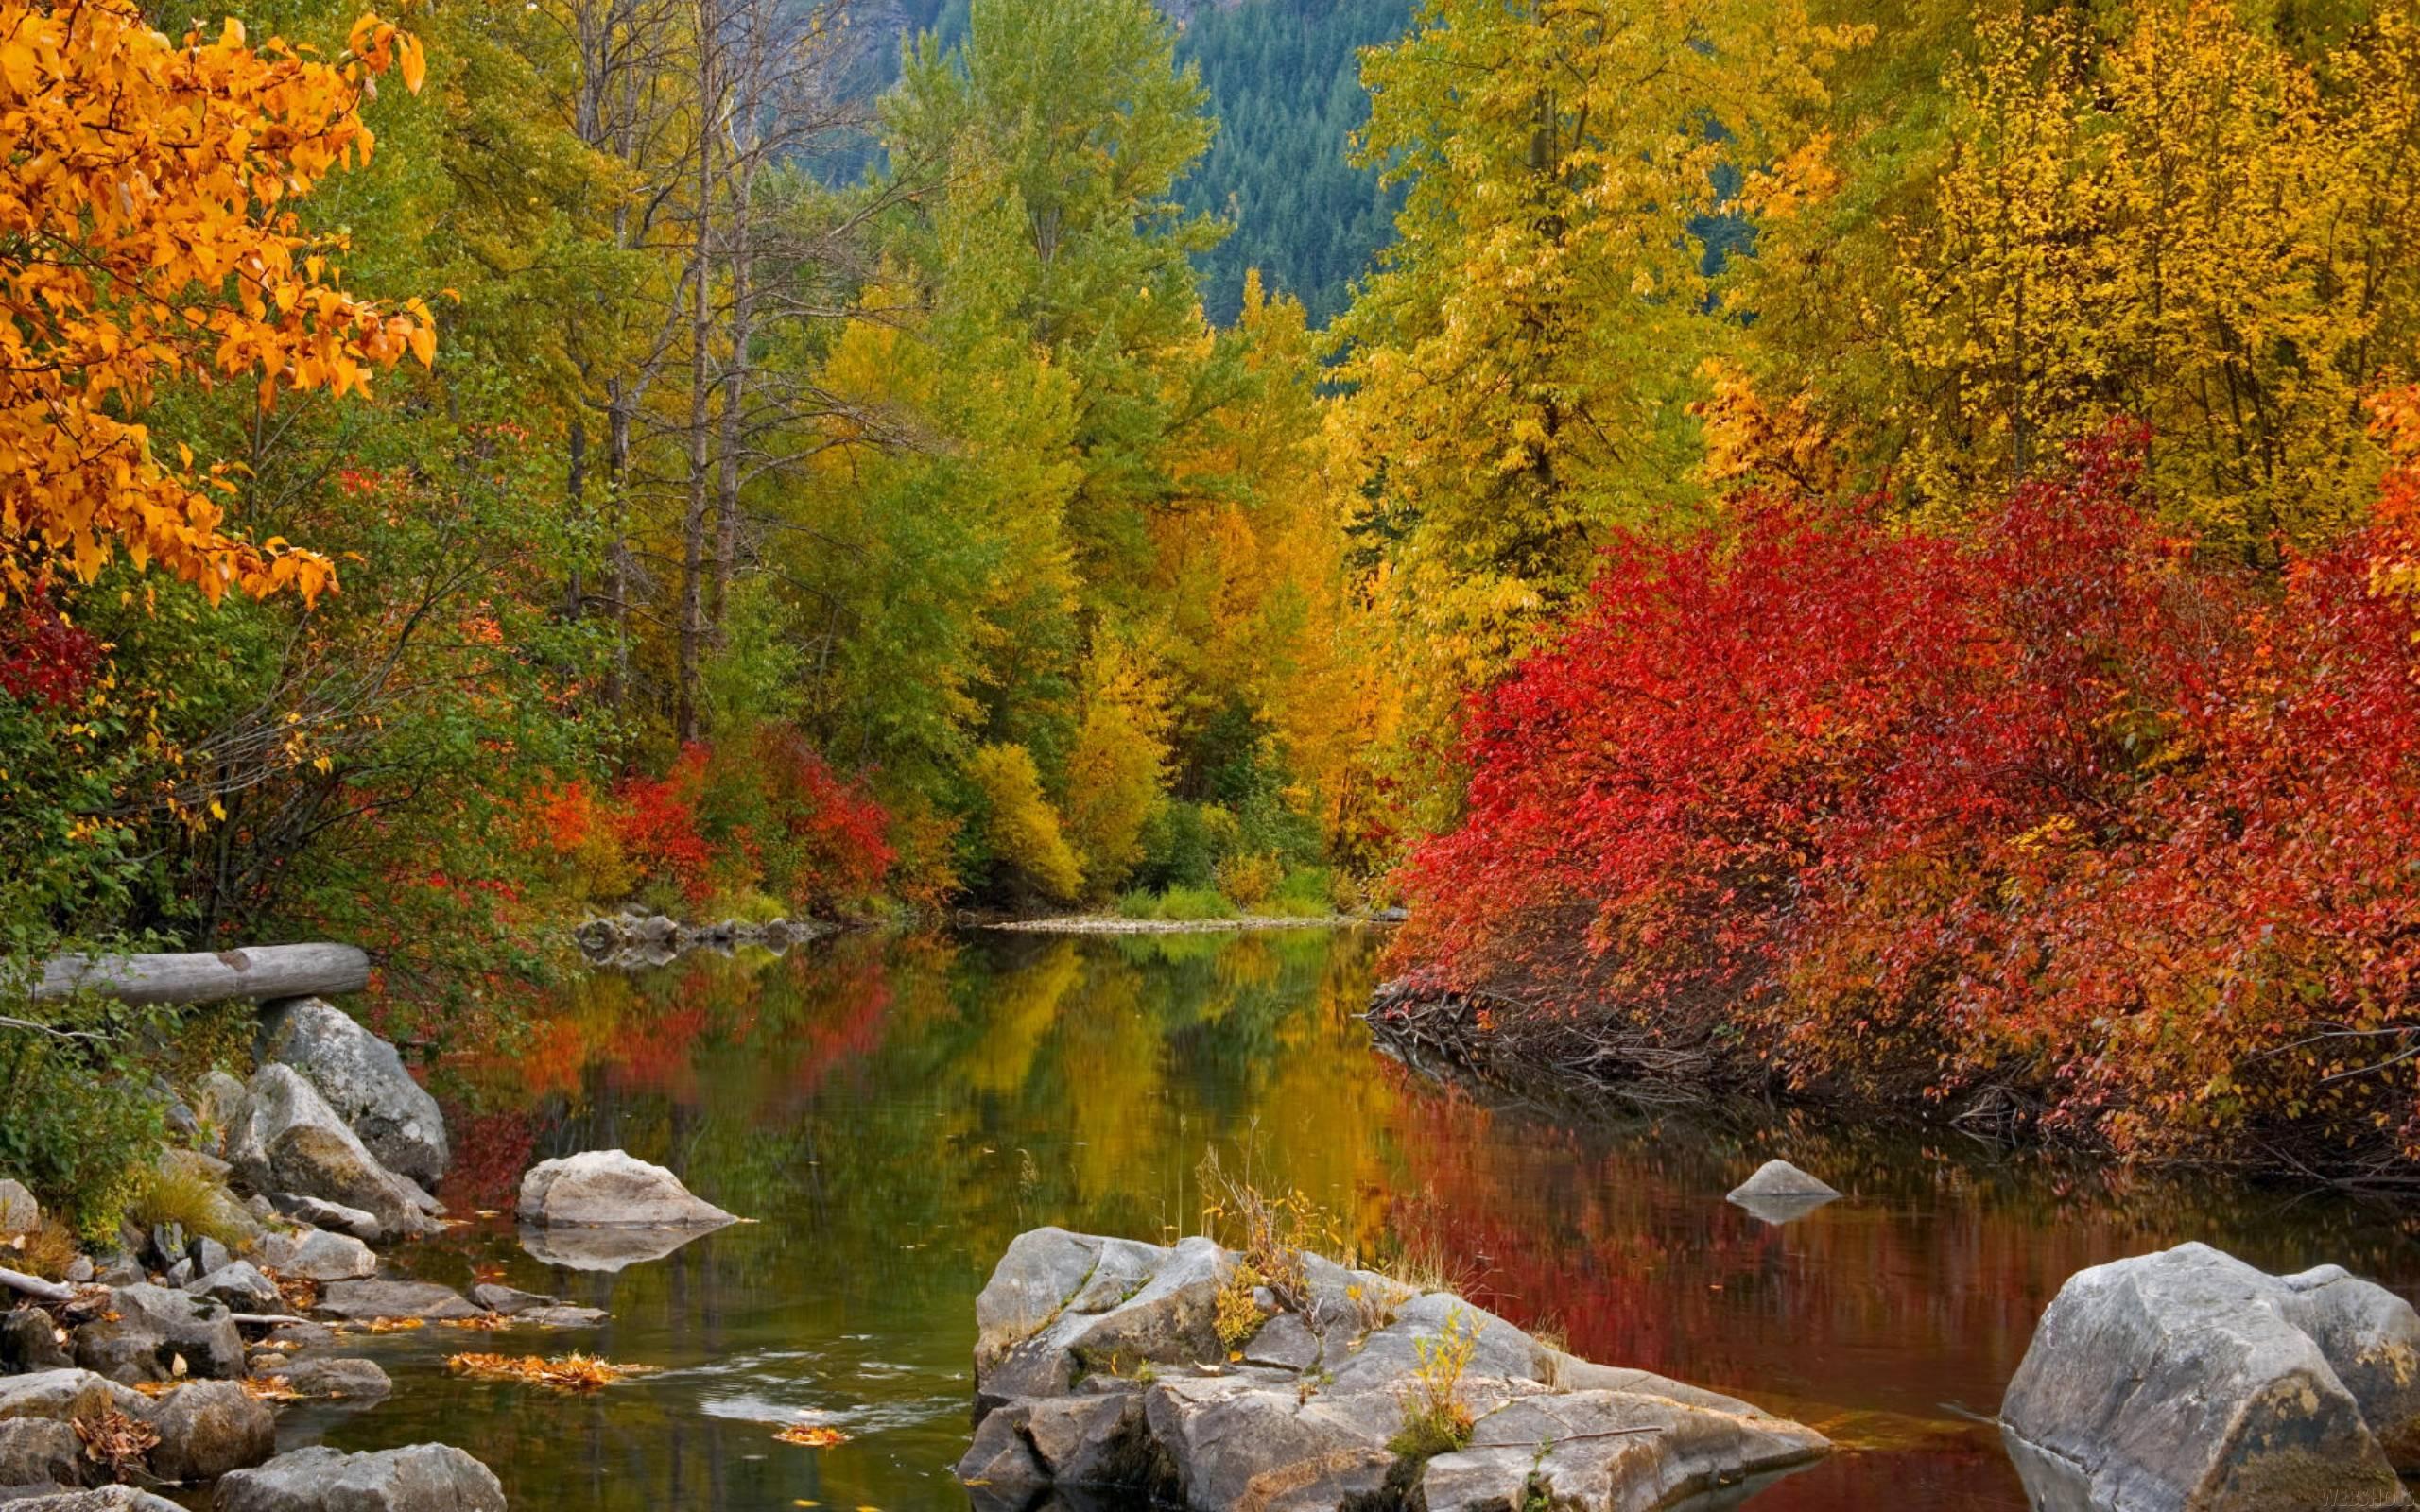 Collection of Fall Desktop Wallpaper Widescreen on HDWallpapers